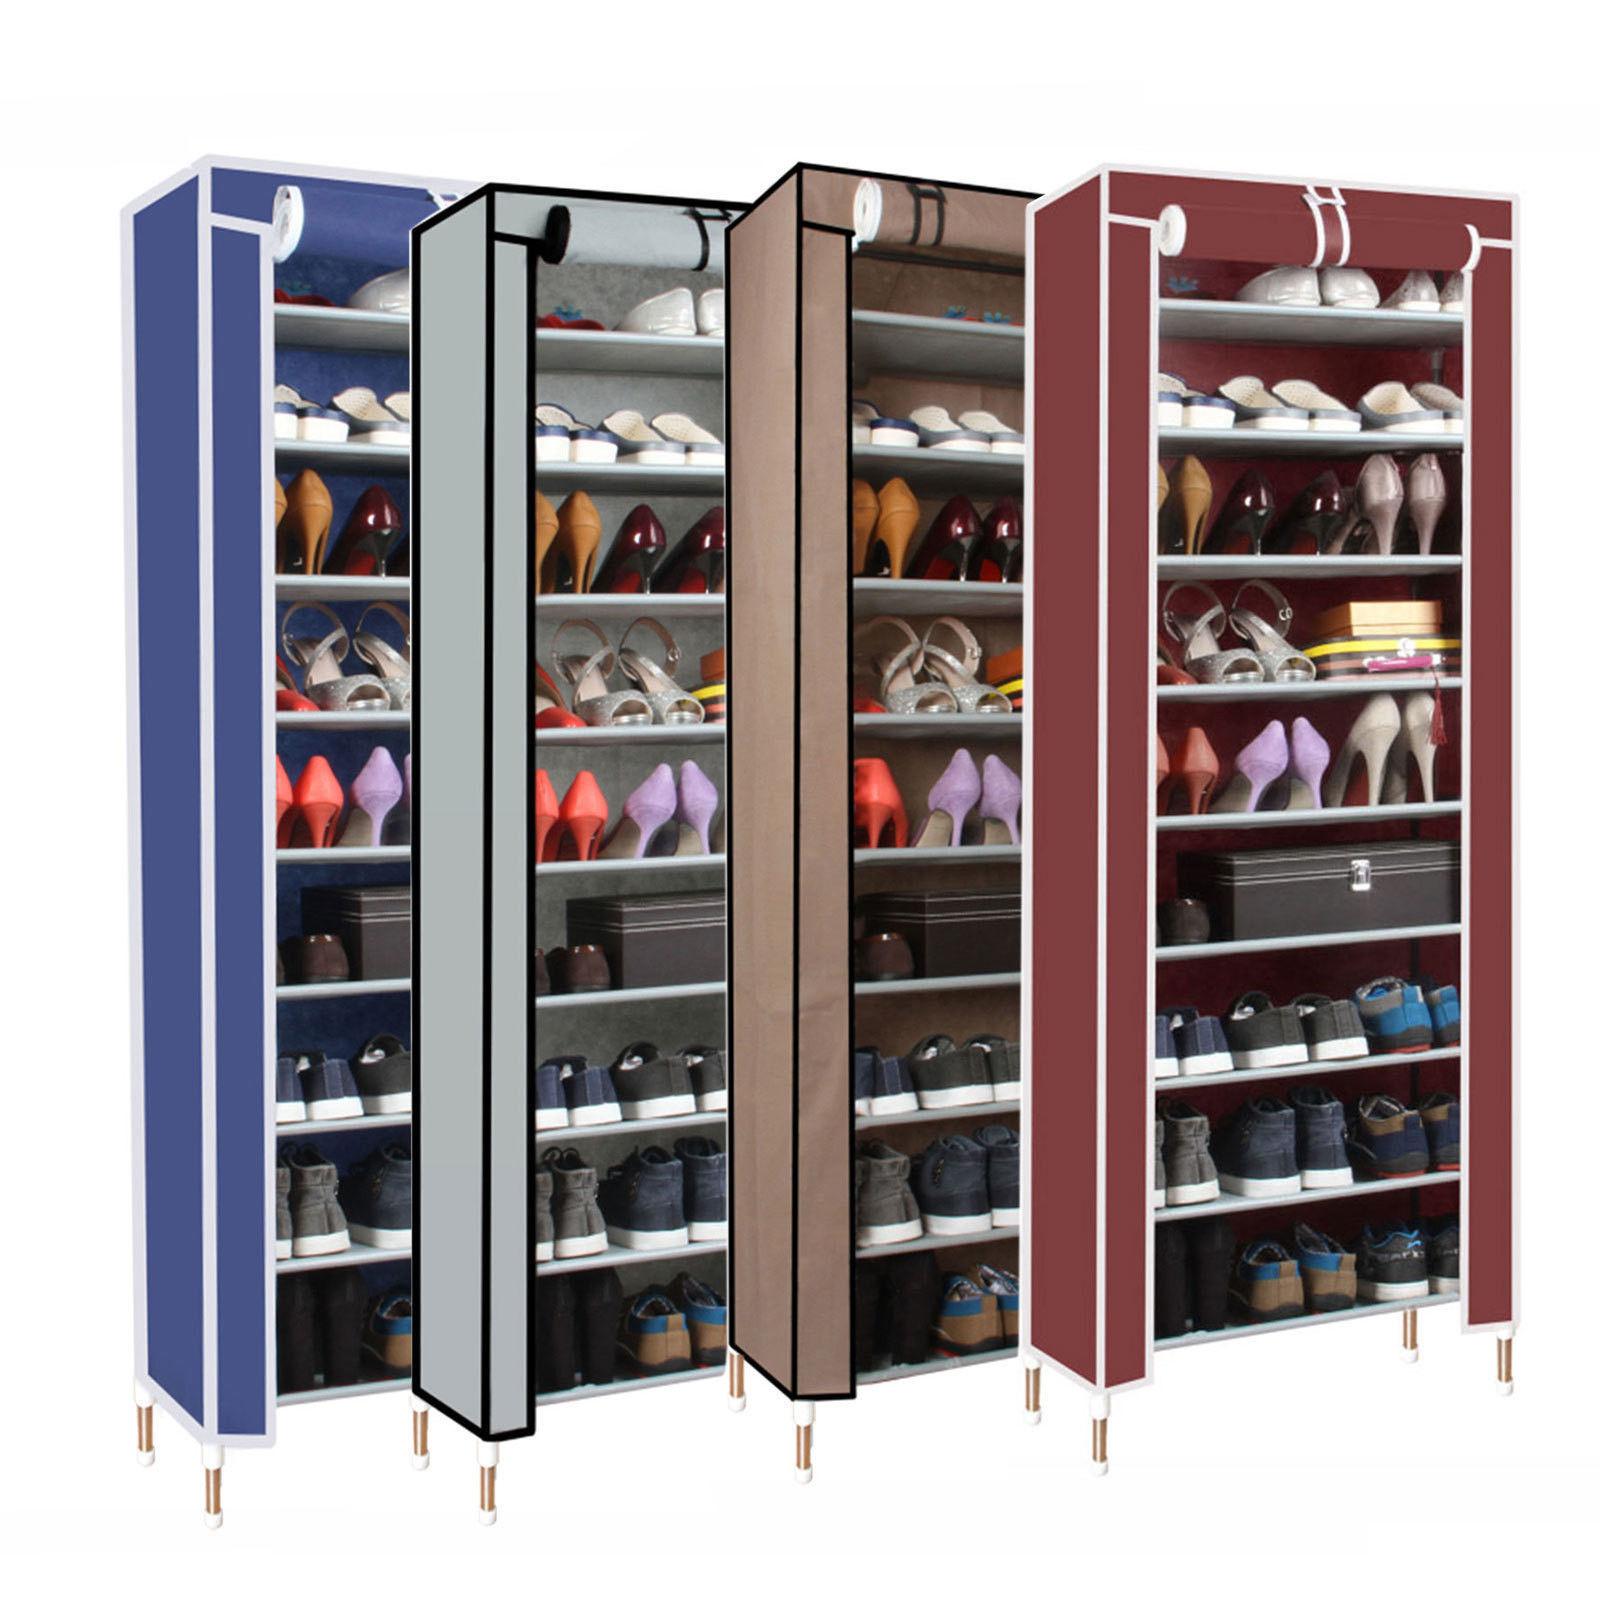 Dust proof 10 Tier Shoes Cabinet Storage Organizer Shoe